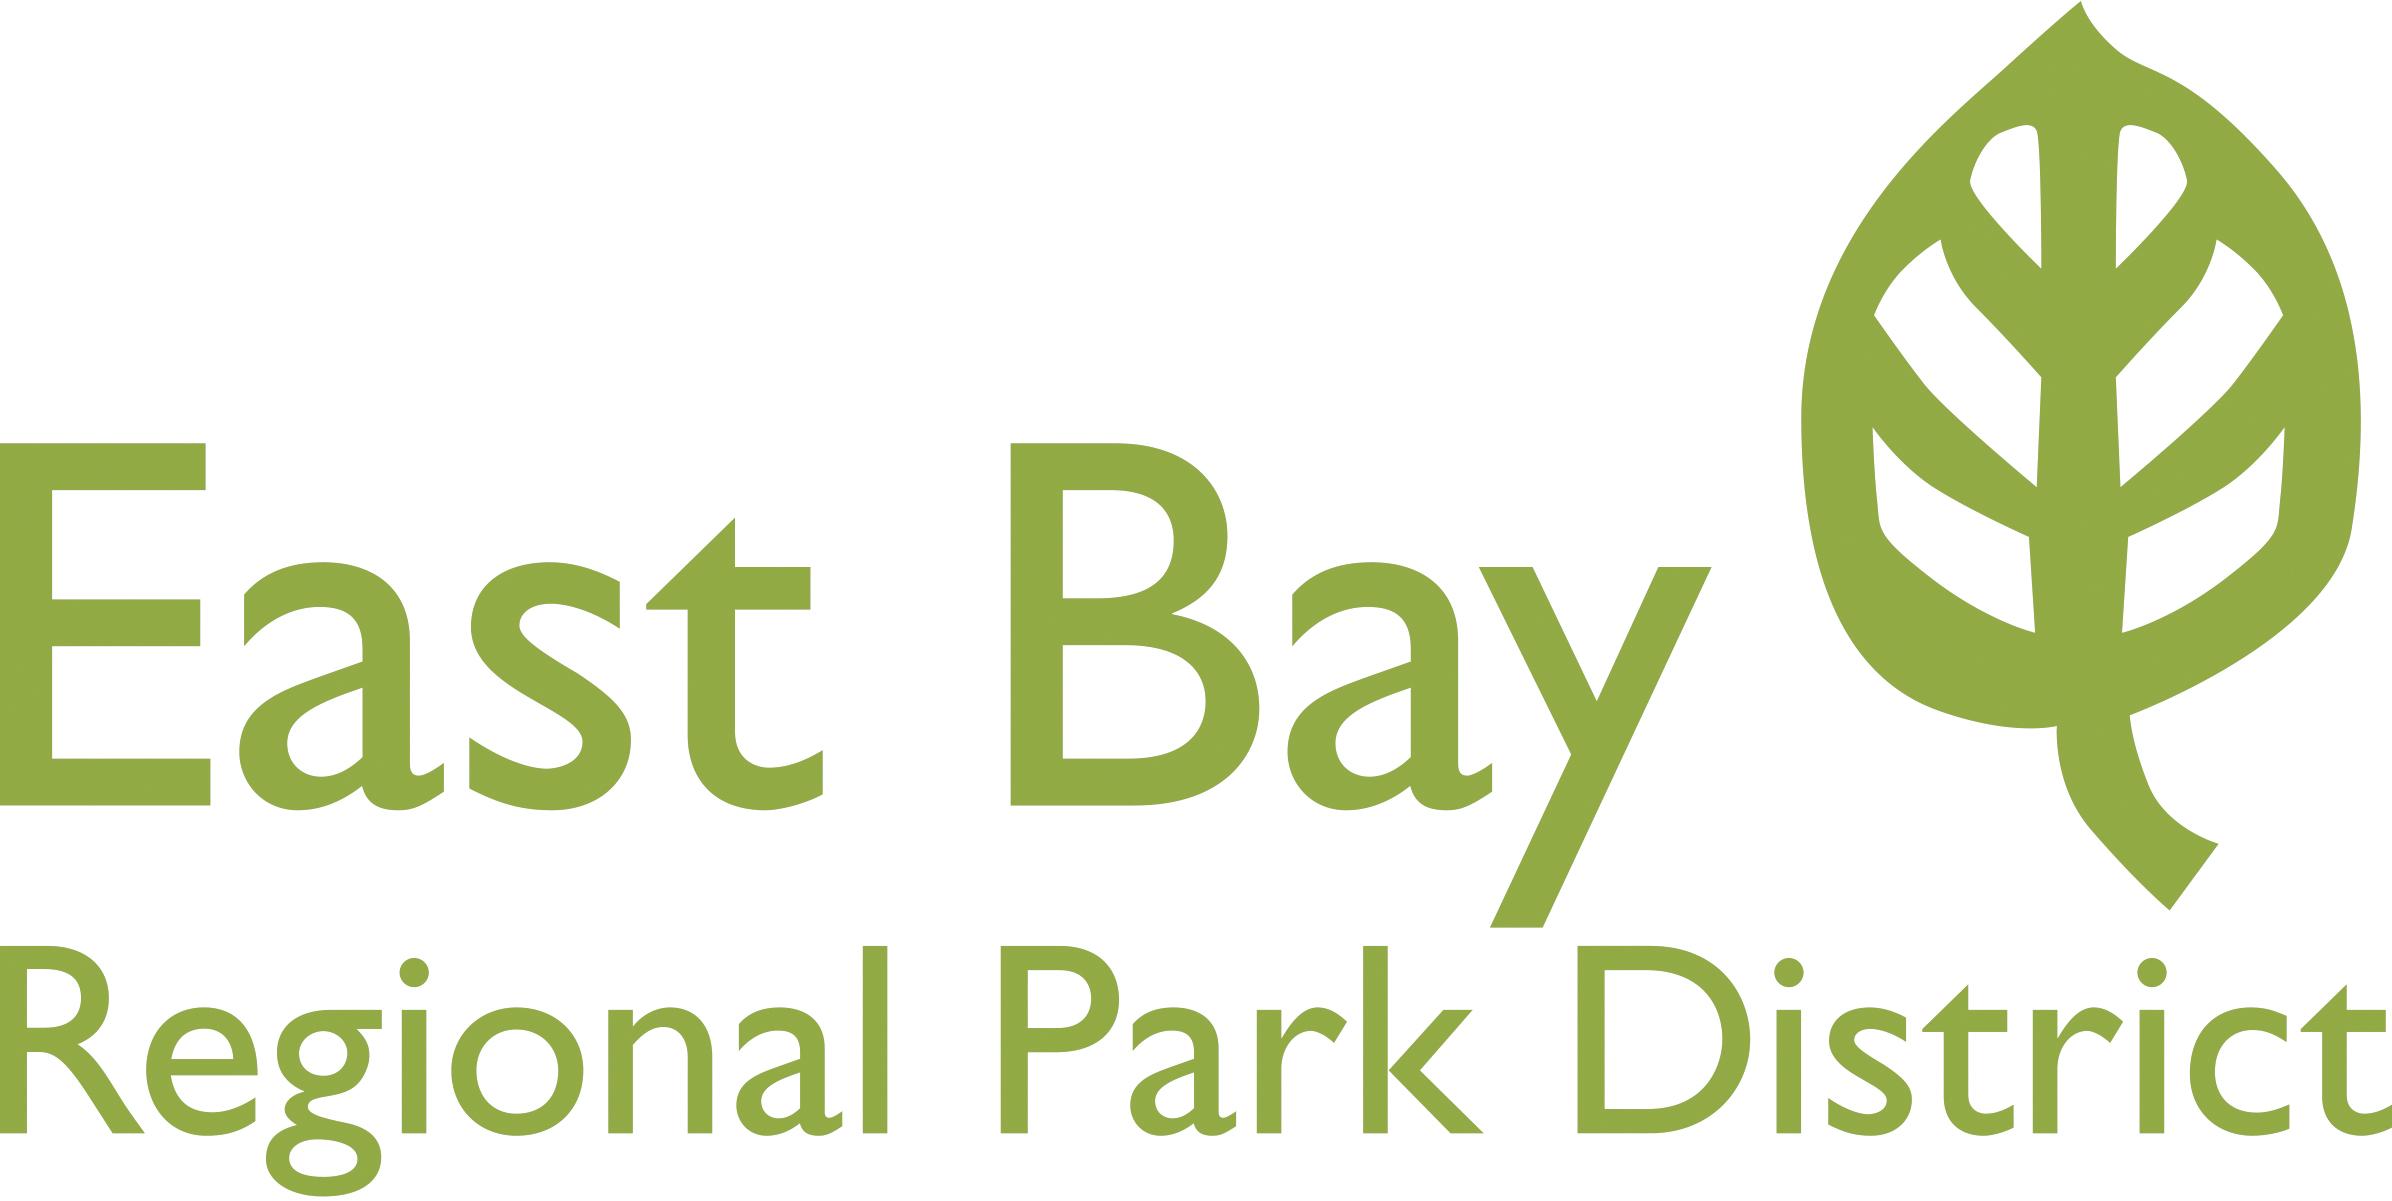 East Bay Regional Park District logo